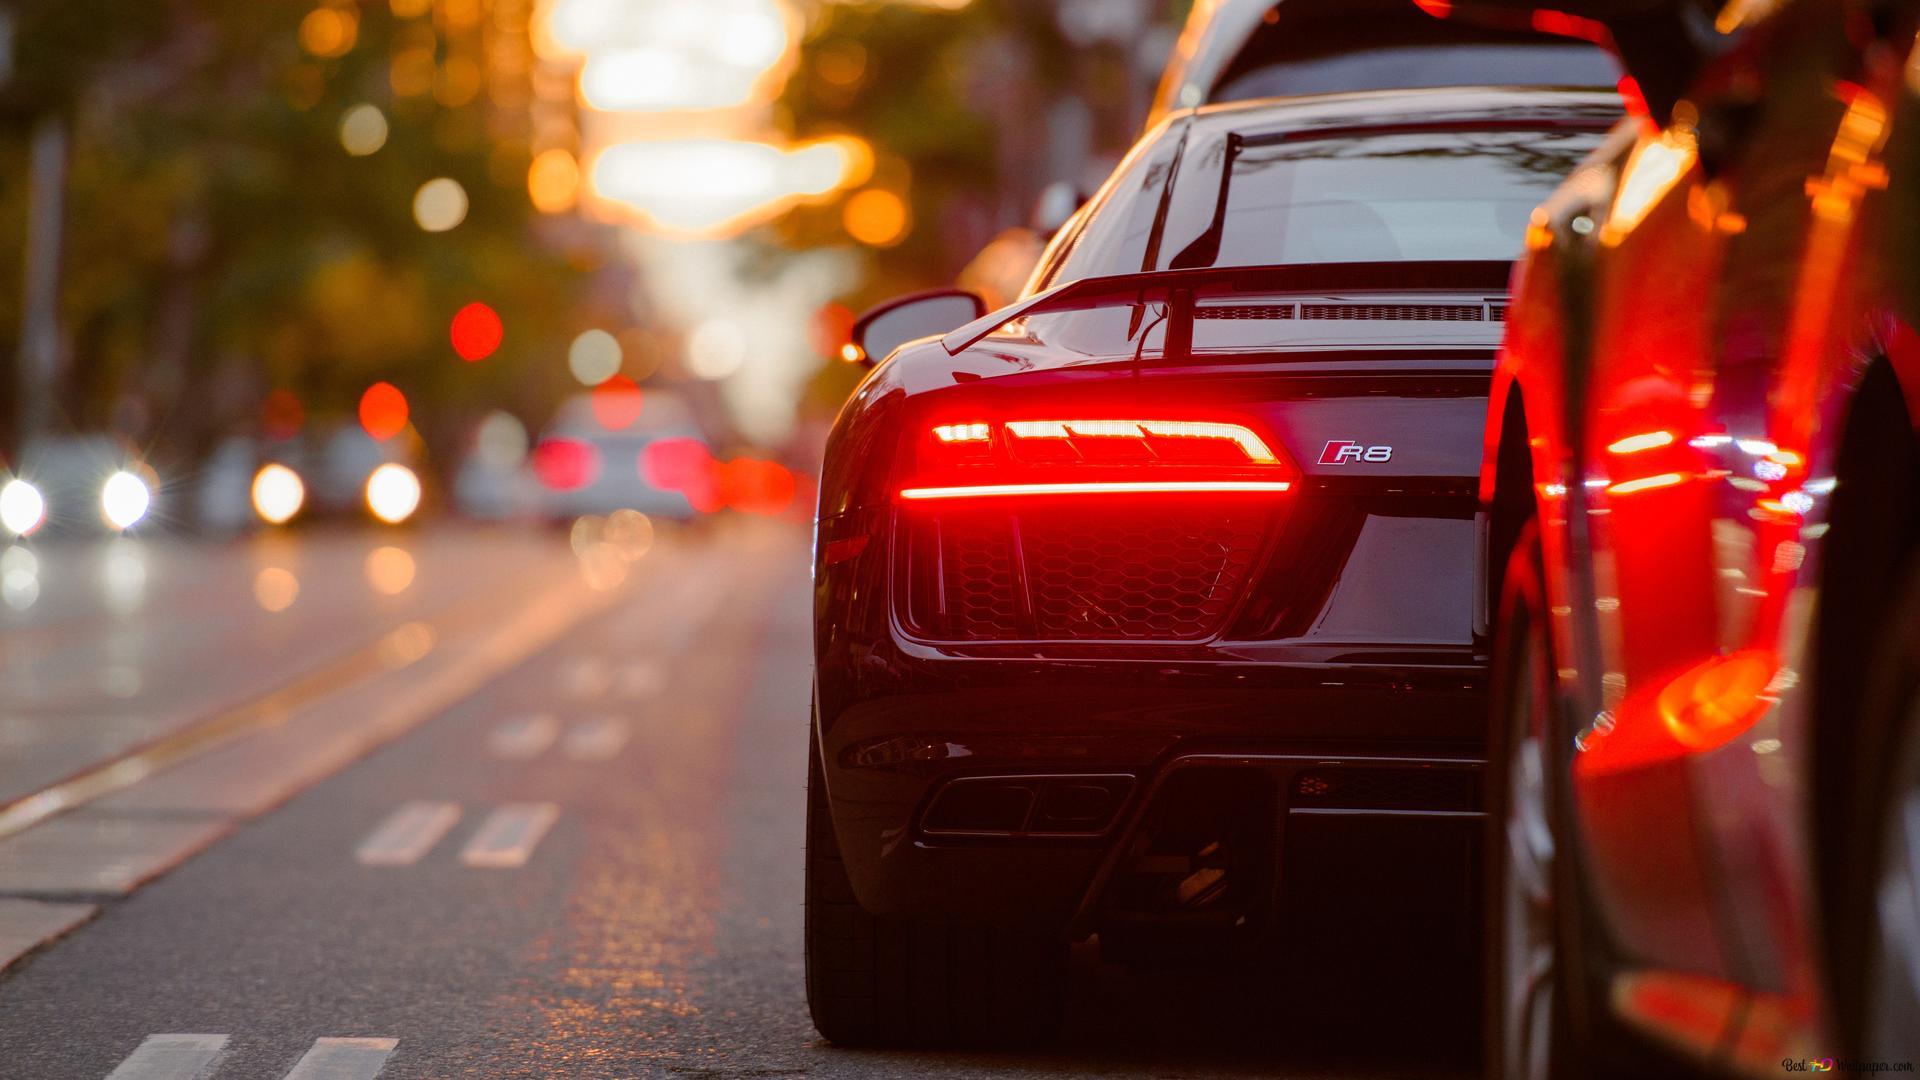 Black Audi R8 Parked Beside Road Hd Wallpaper Download